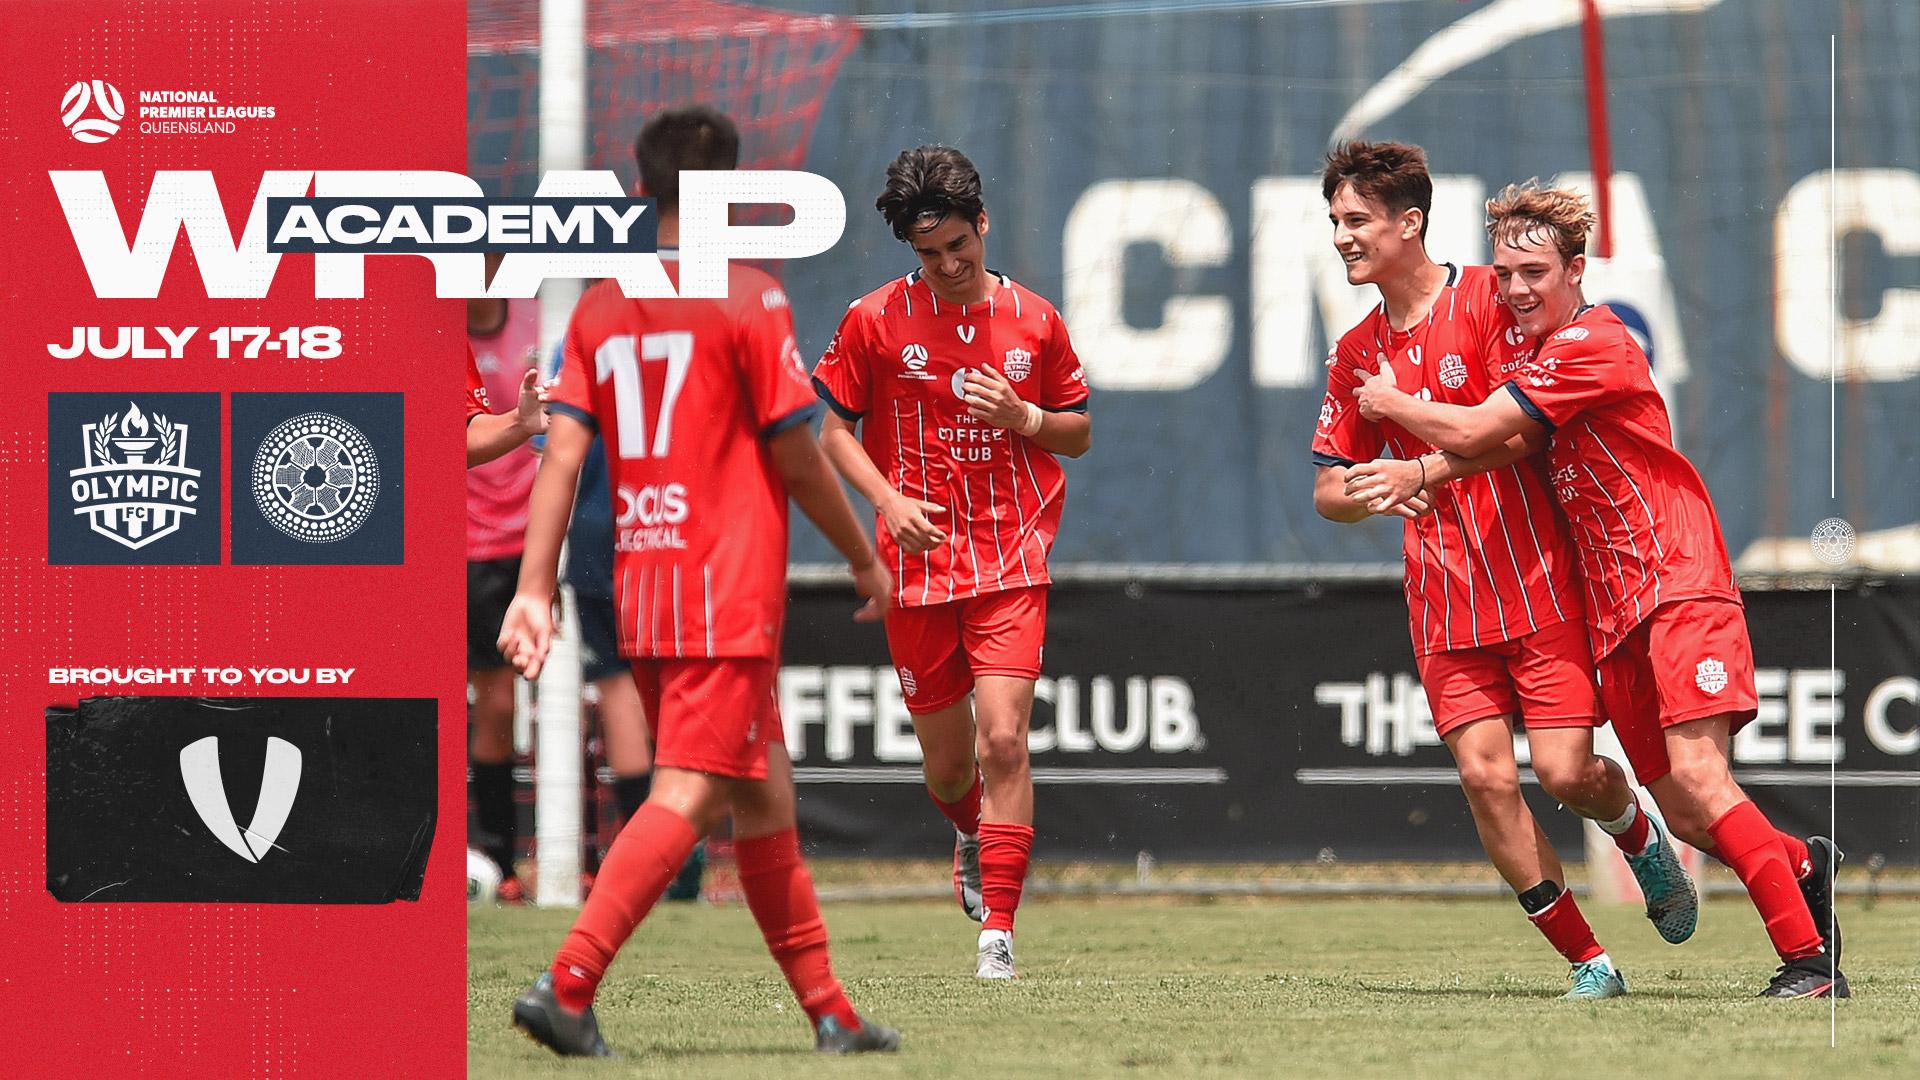 Veto Sports Academy Wrap: July 17 & 18